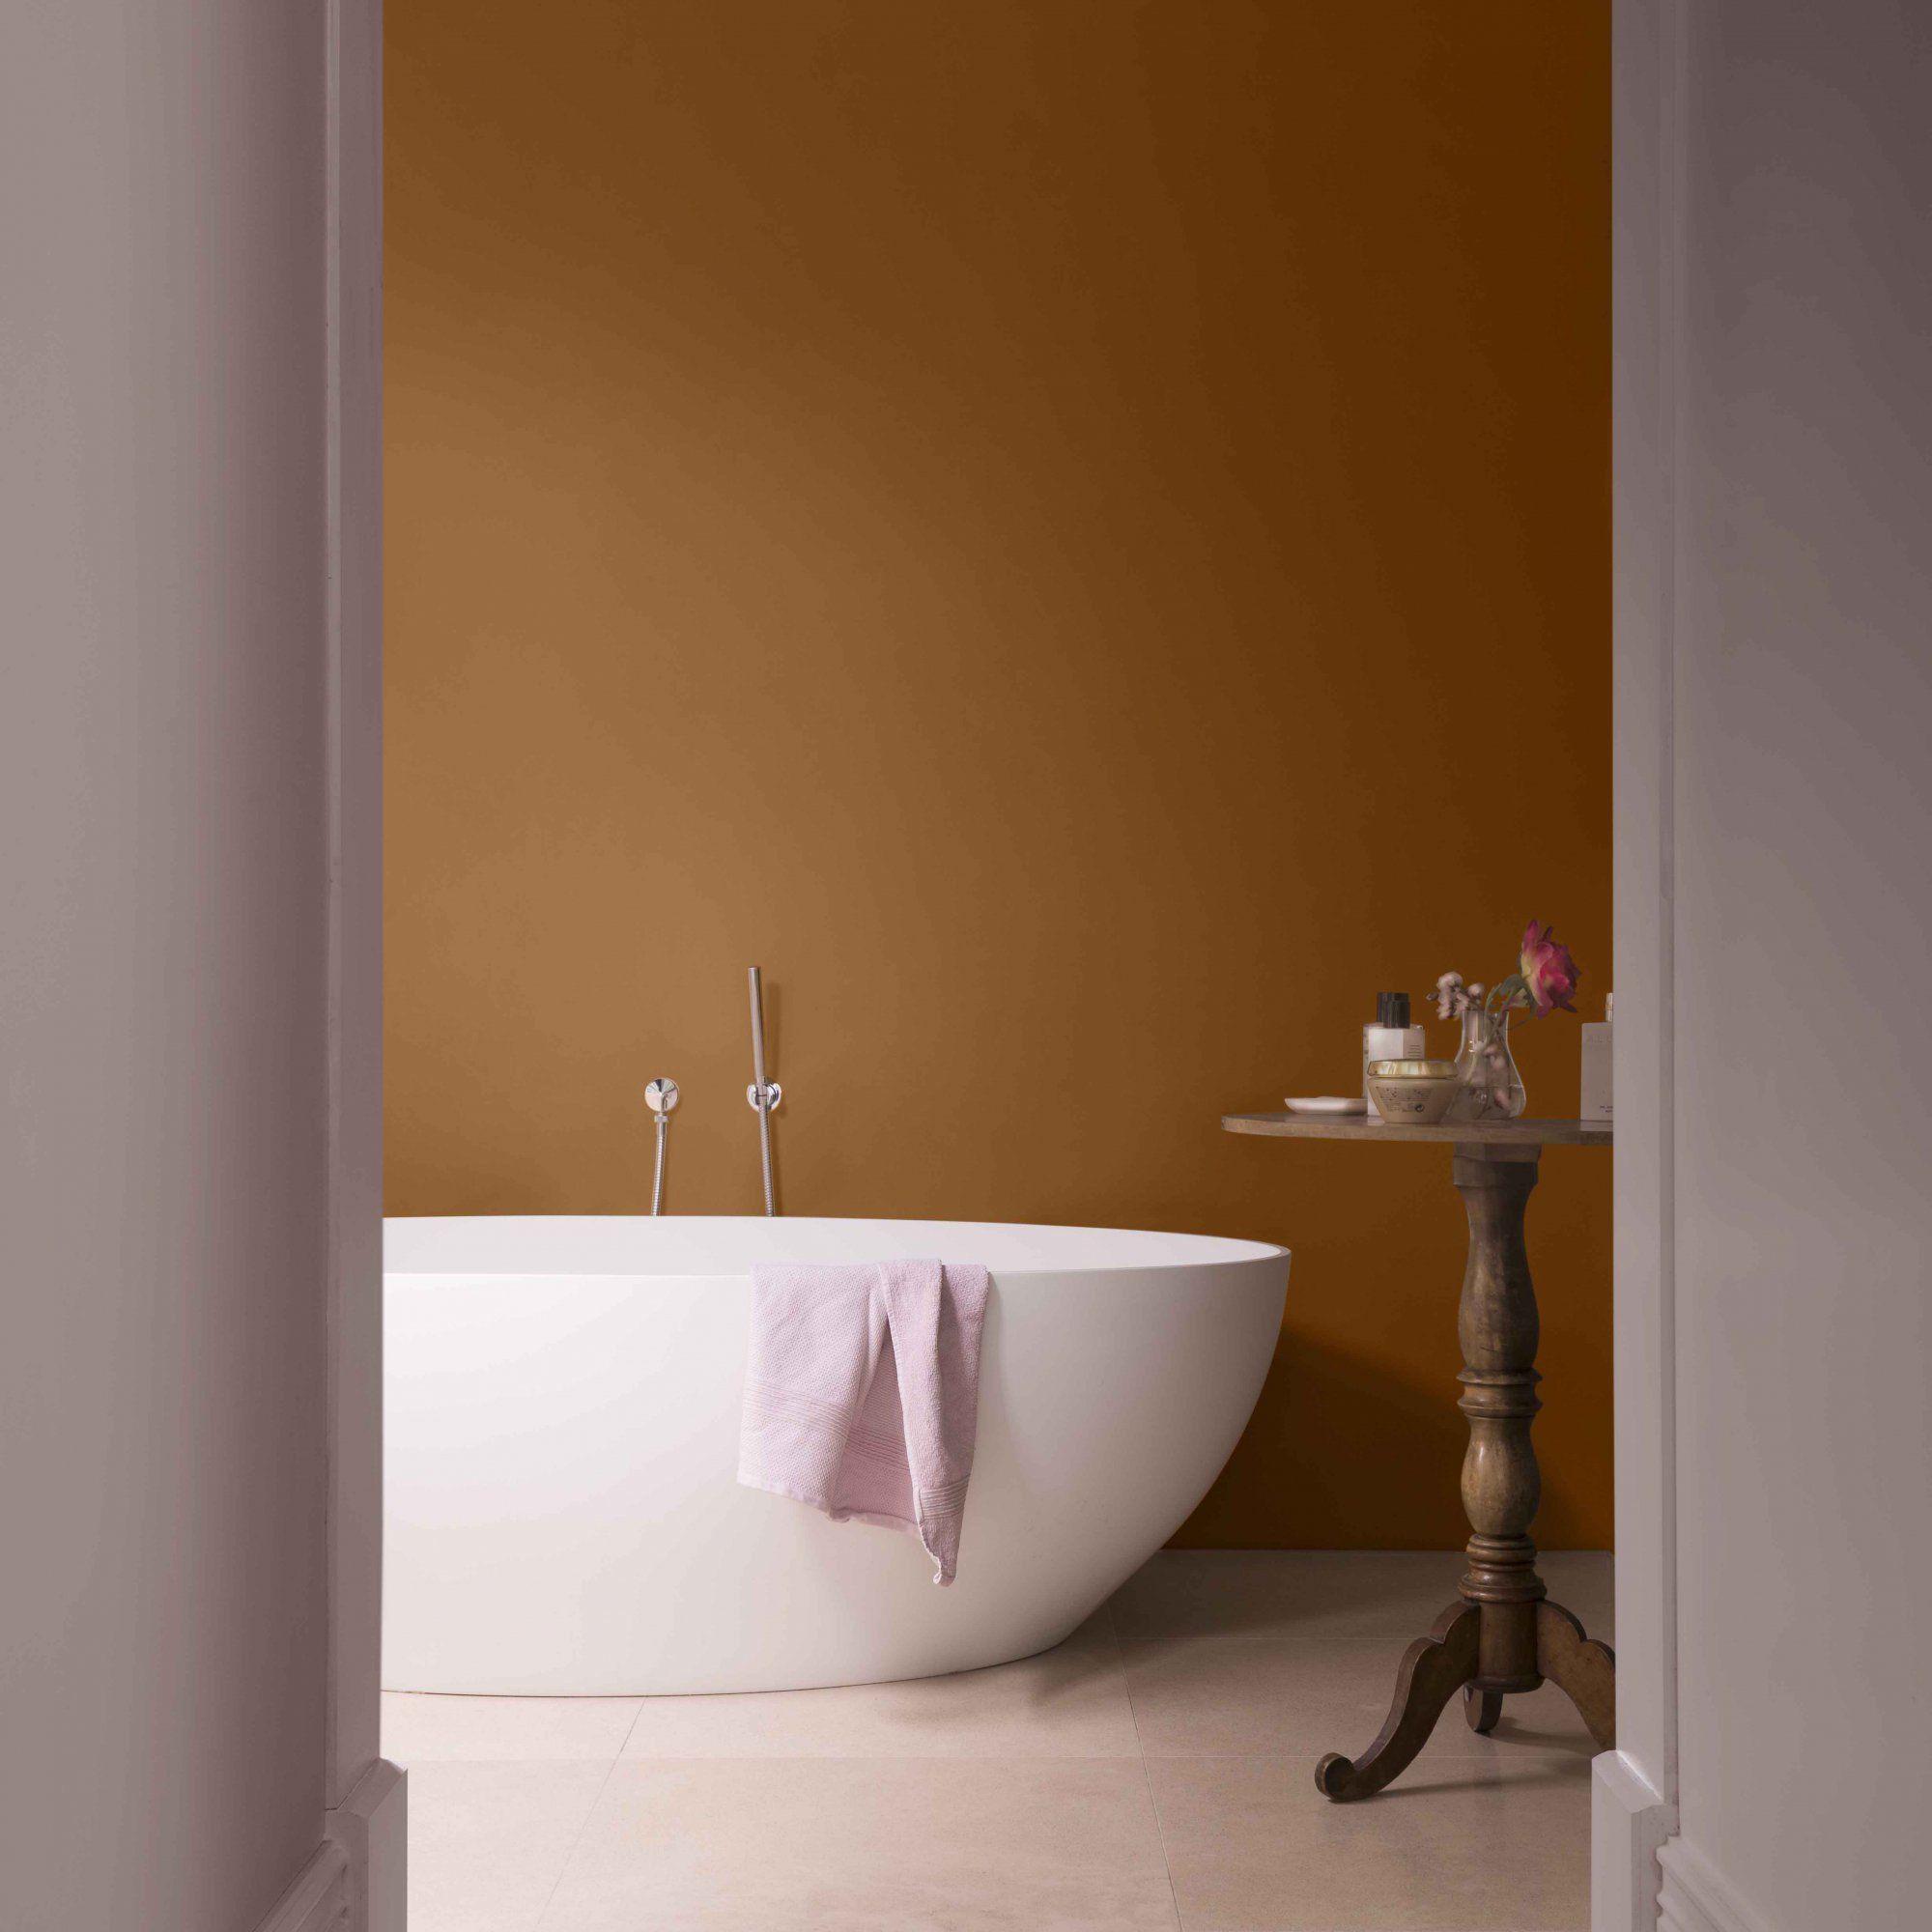 Une salle de bains ocre | IN A PERFECT HOME | Salle de bains ...